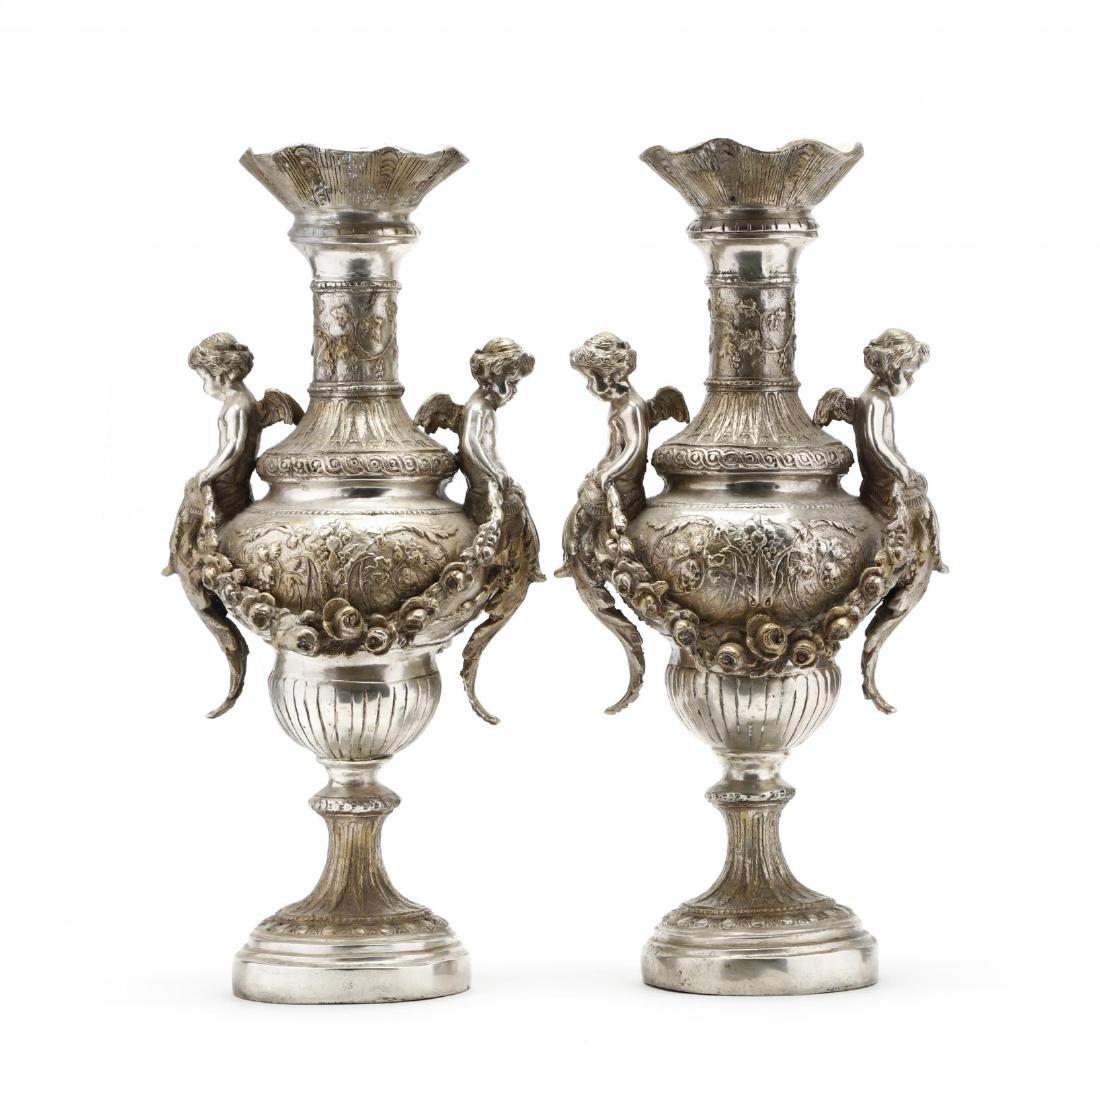 A Pair of Silvertone Renaissance Revival Style Urns